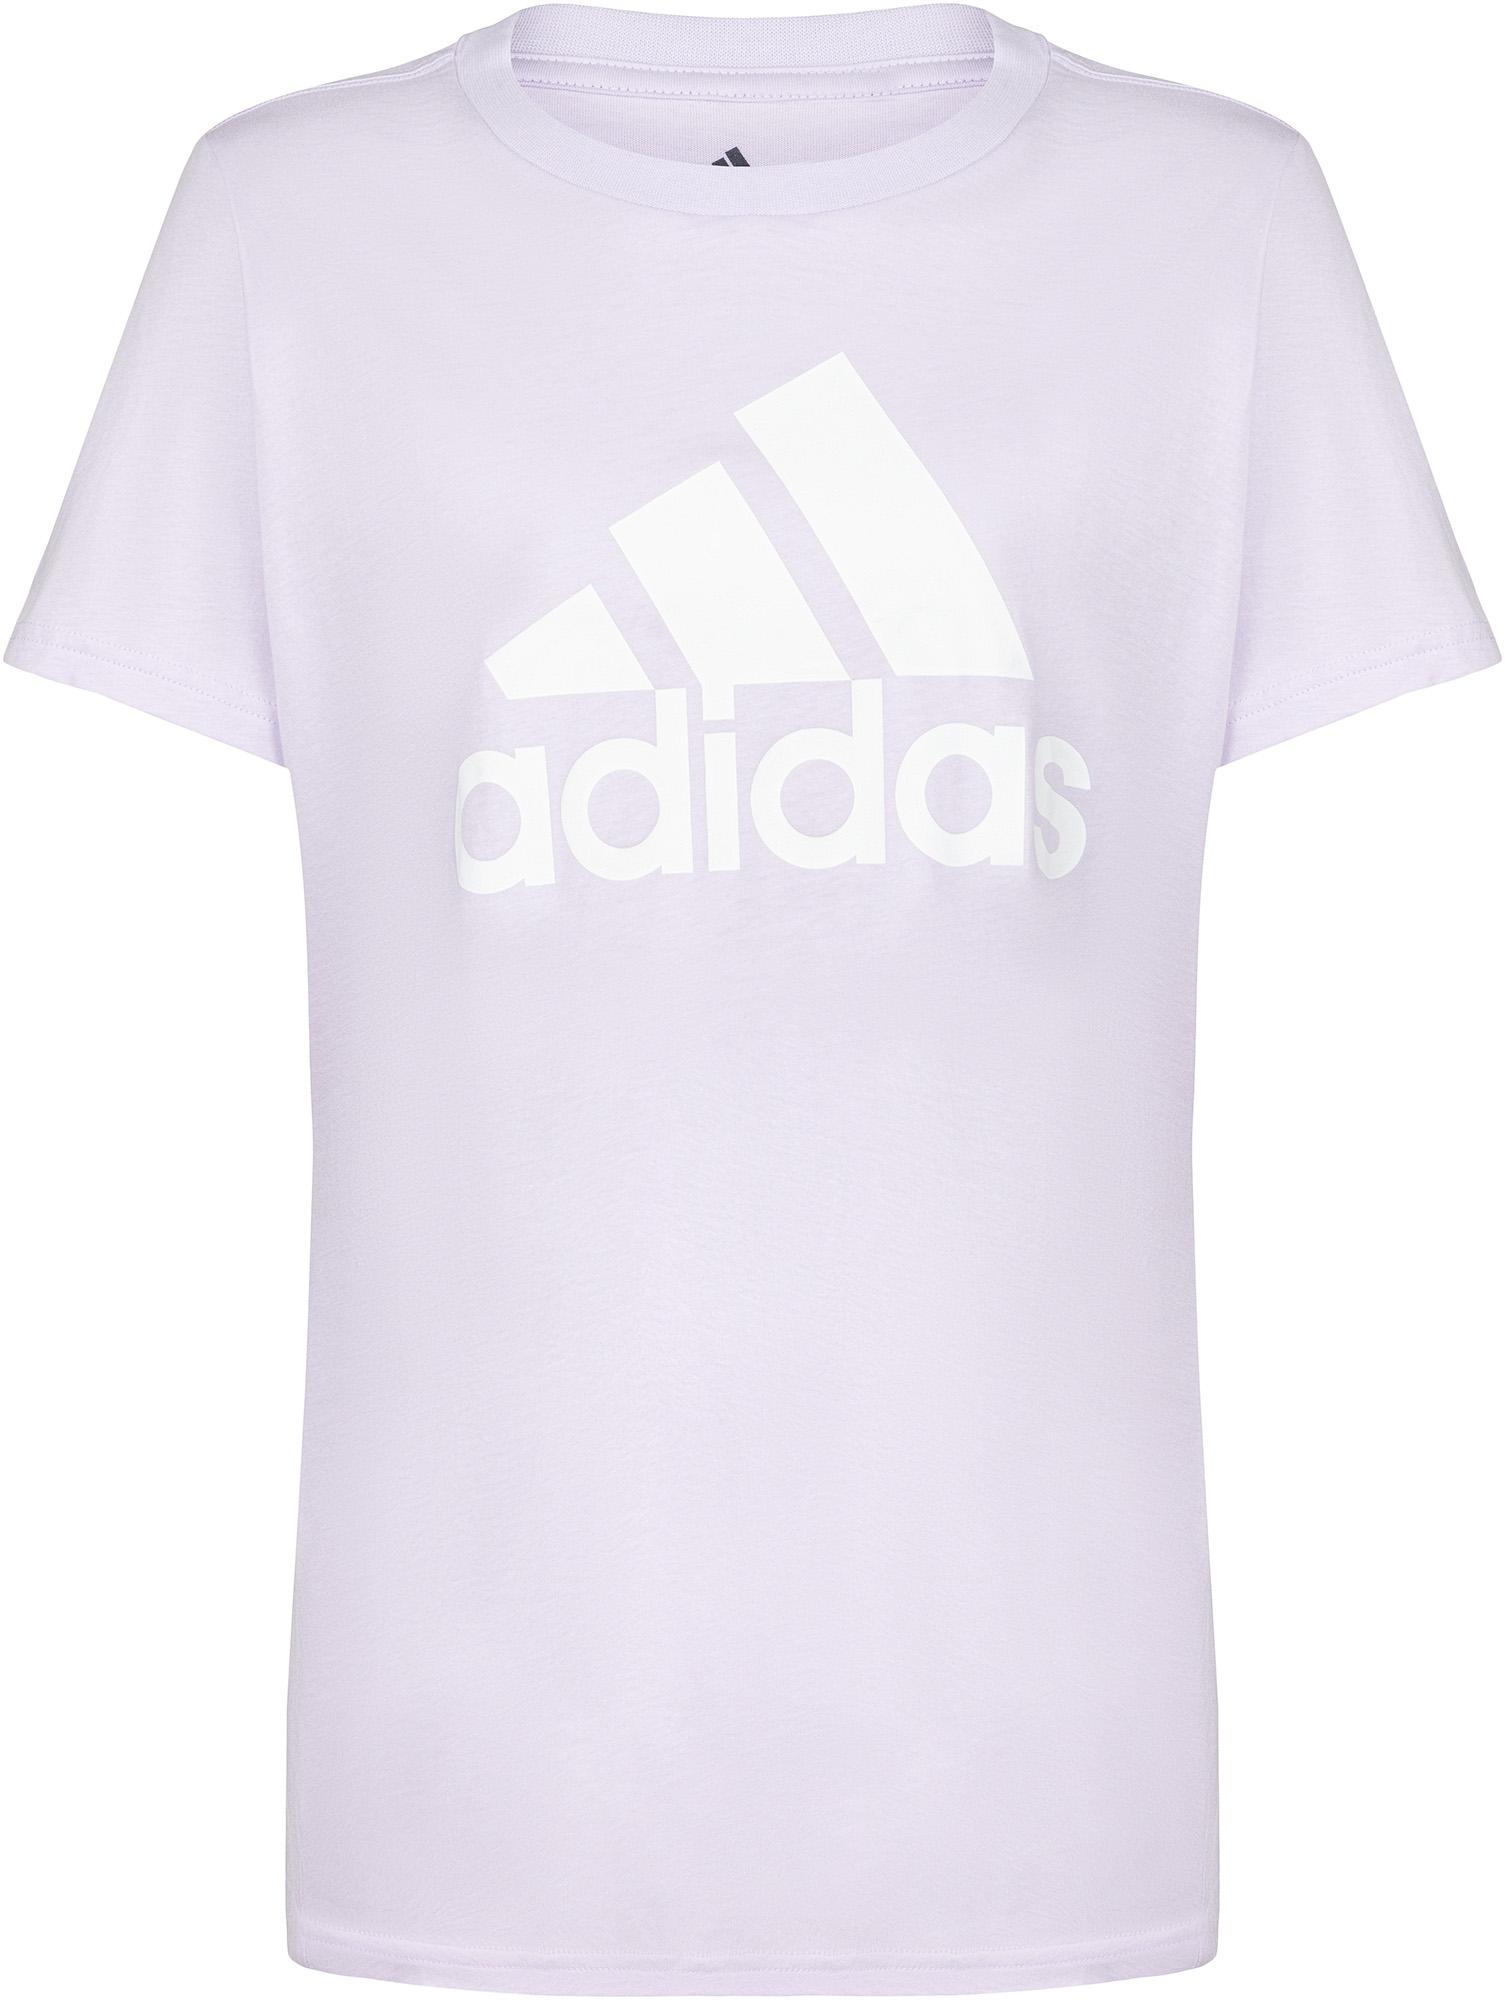 Adidas Футболка женская adidas Badge of Sport, Plus Size, размер 54-56